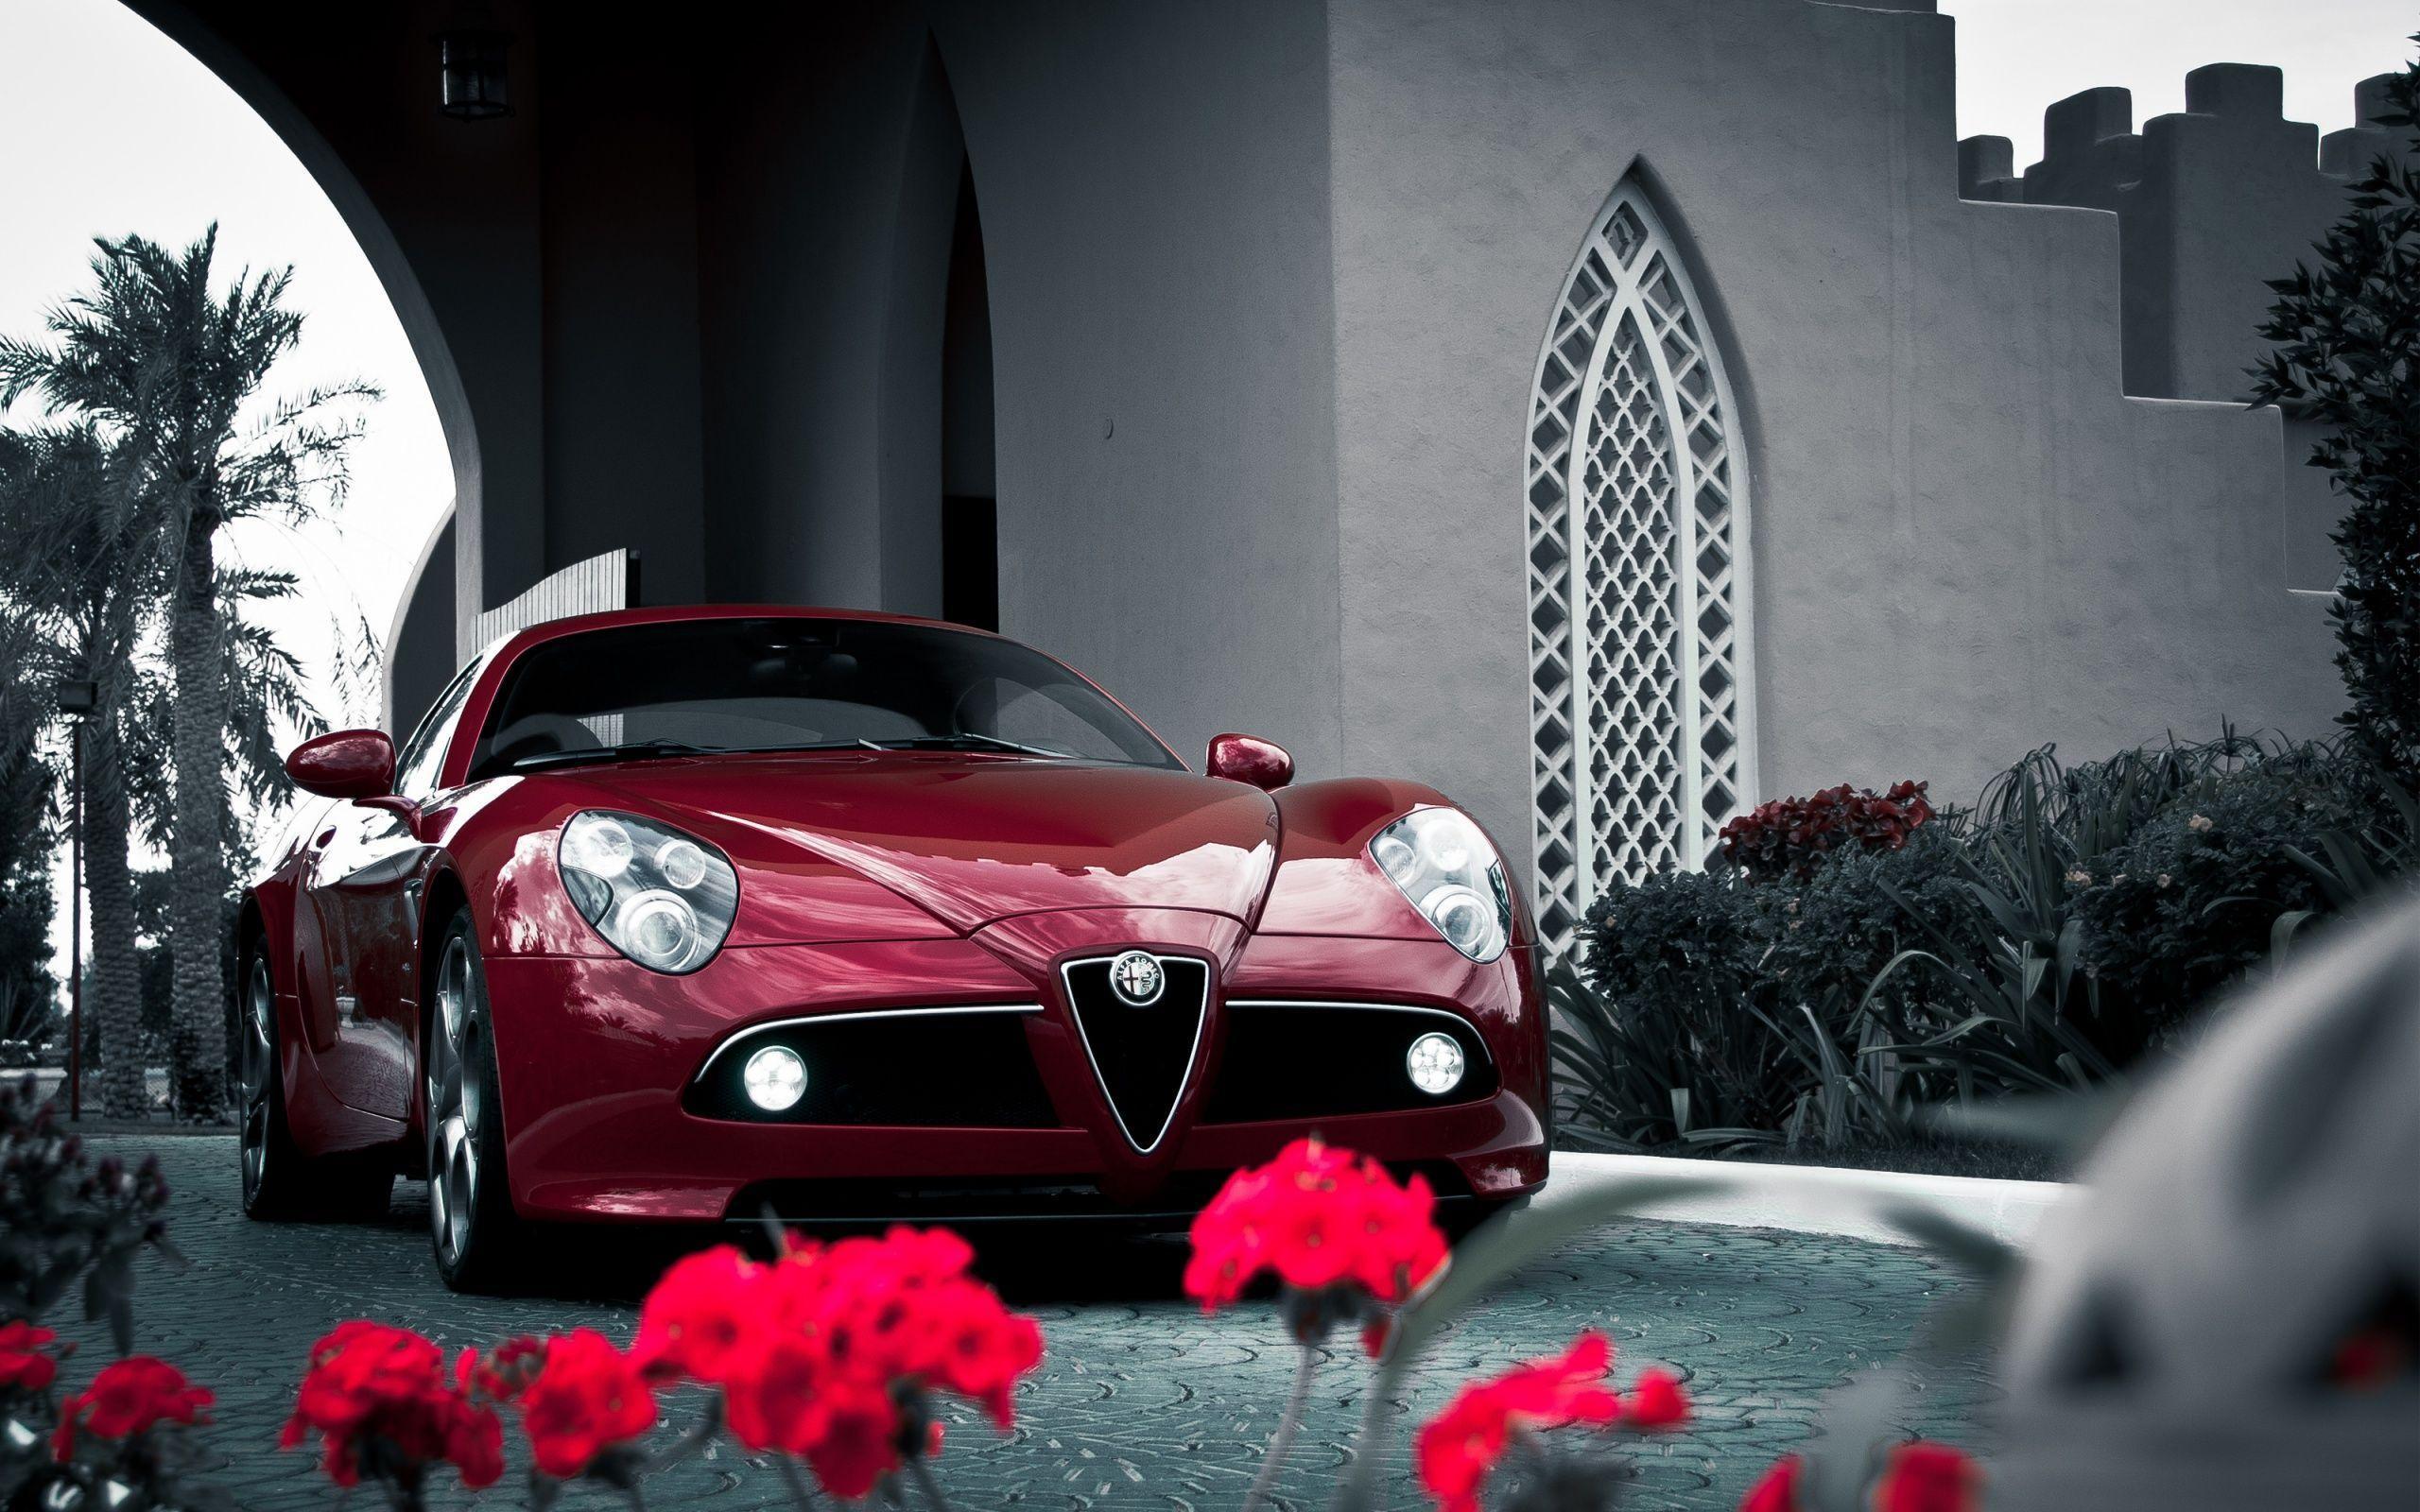 Alfa Romeo Car Wallpapers Top Free Alfa Romeo Car Backgrounds Wallpaperaccess